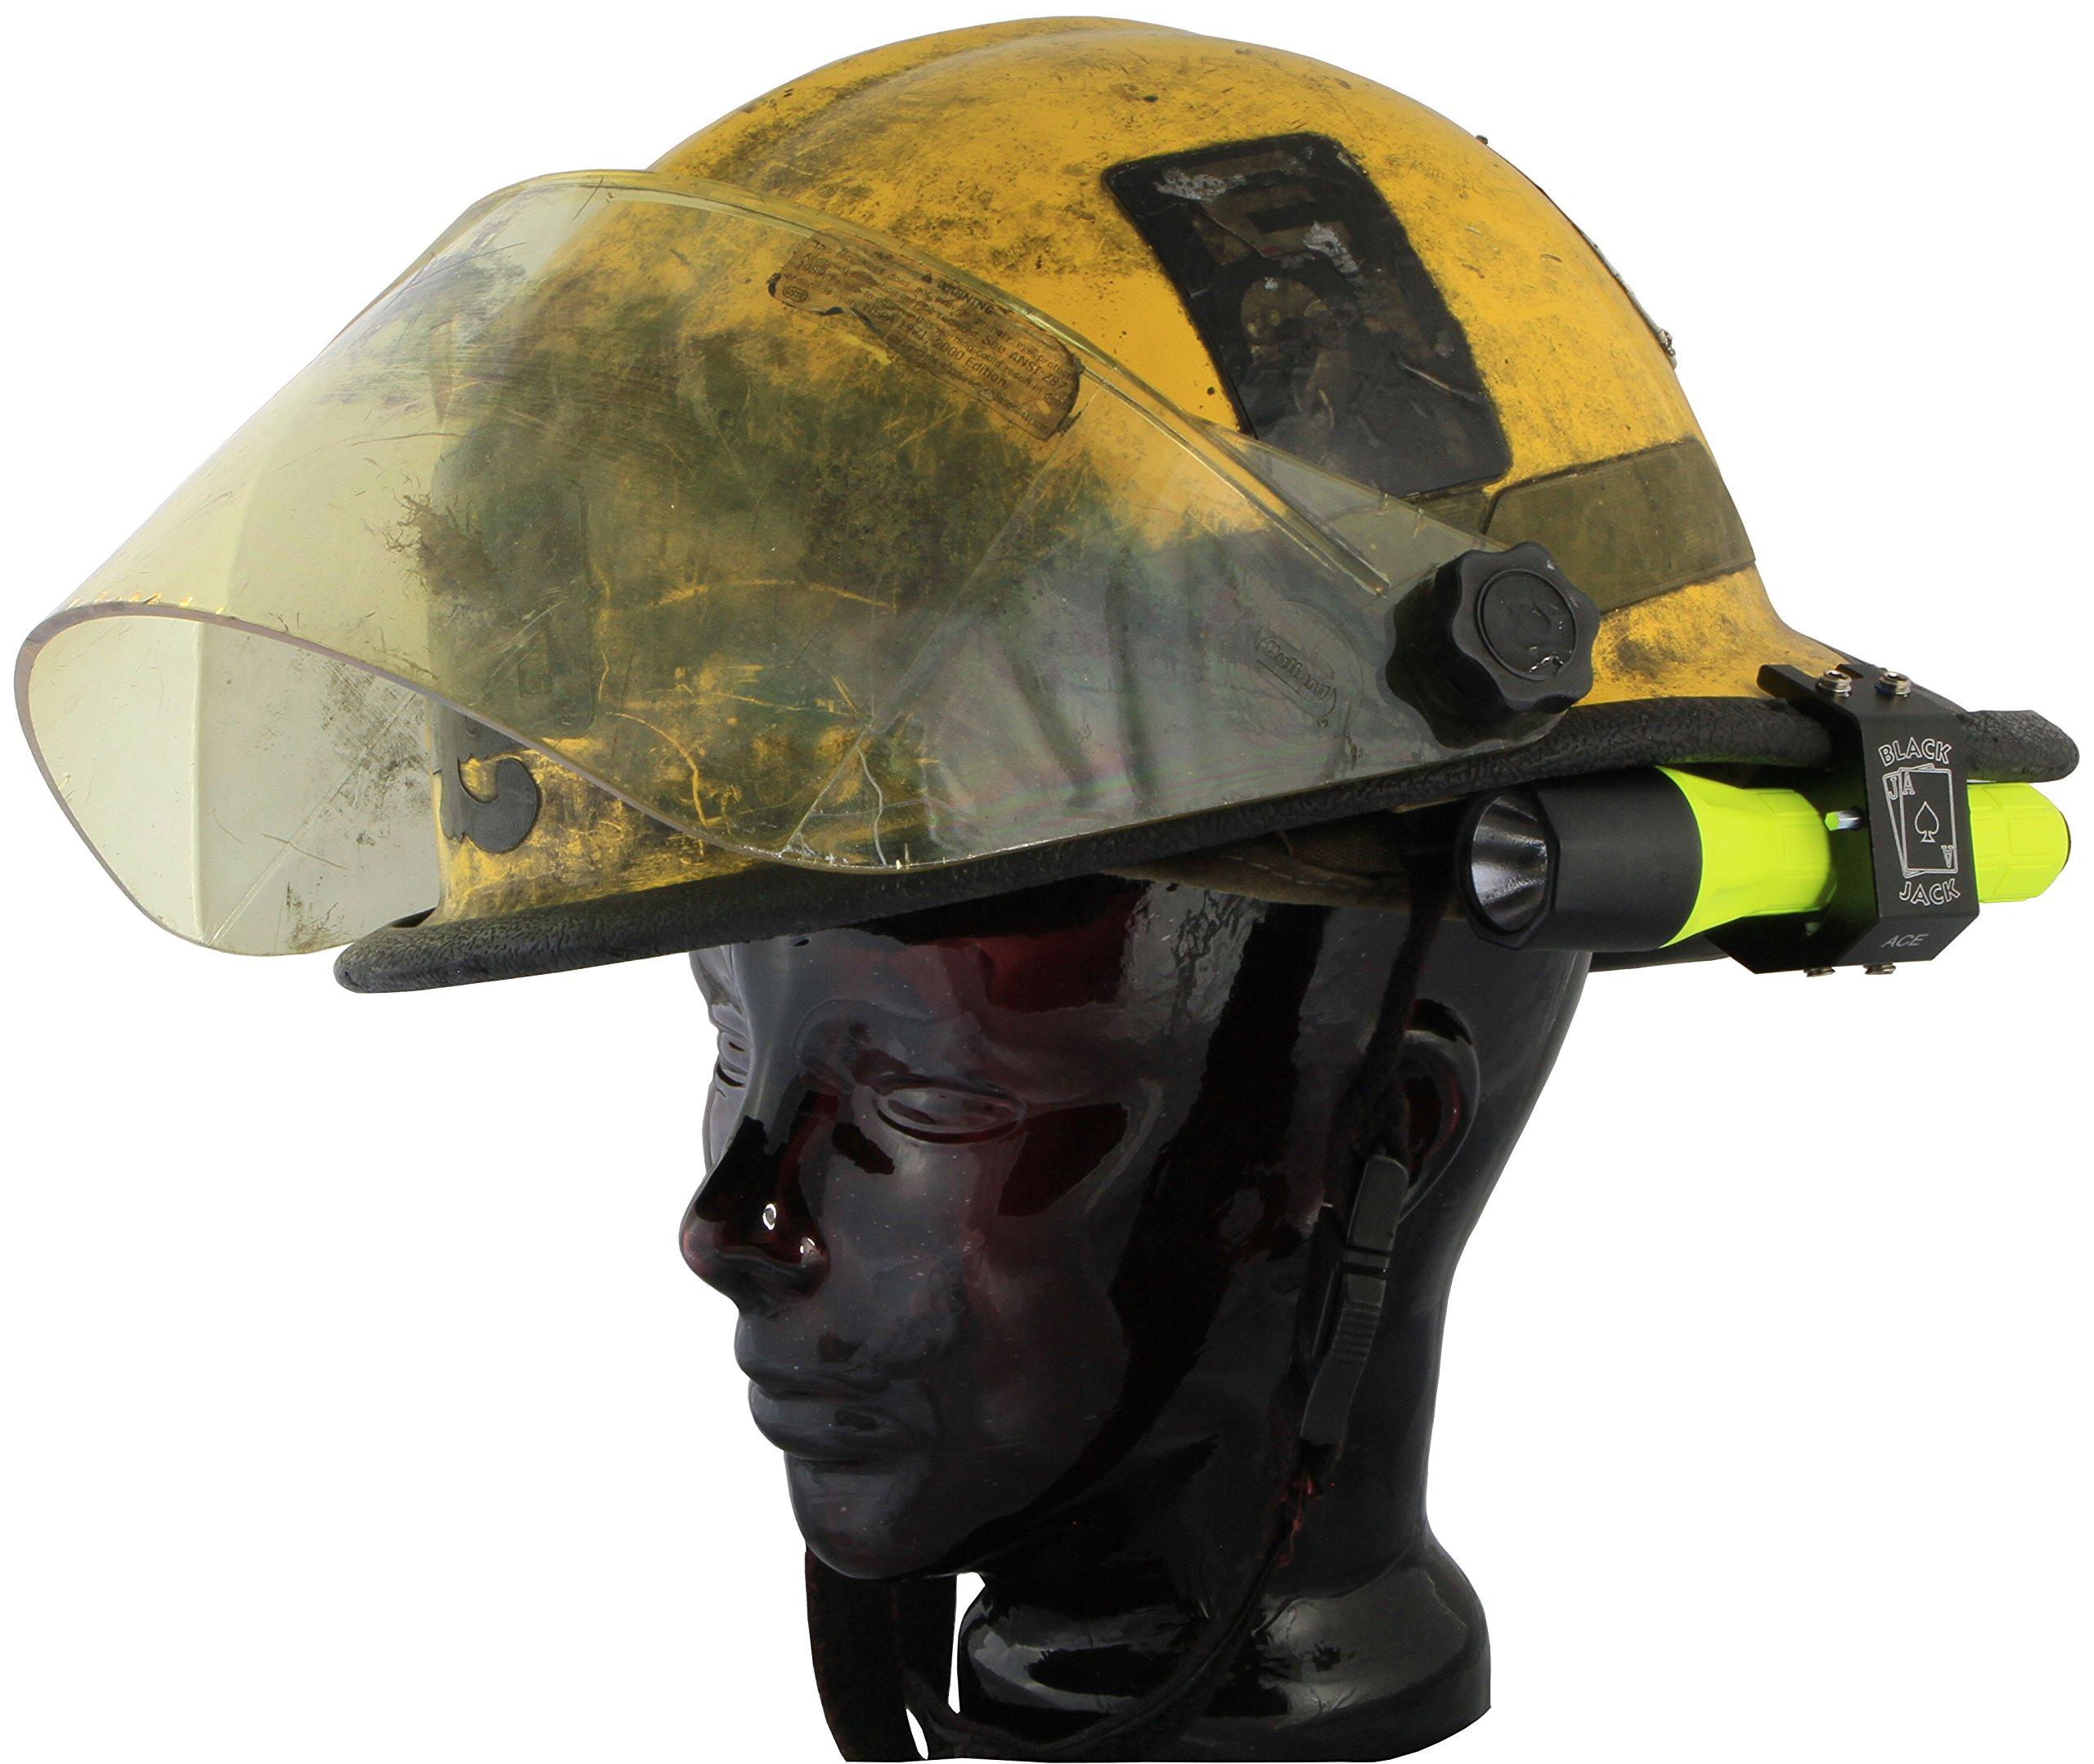 Blackjack ACE Firefighter Helmet Aluminum Flashlight Holder by Blackjack Fire & Safety (Image #8)